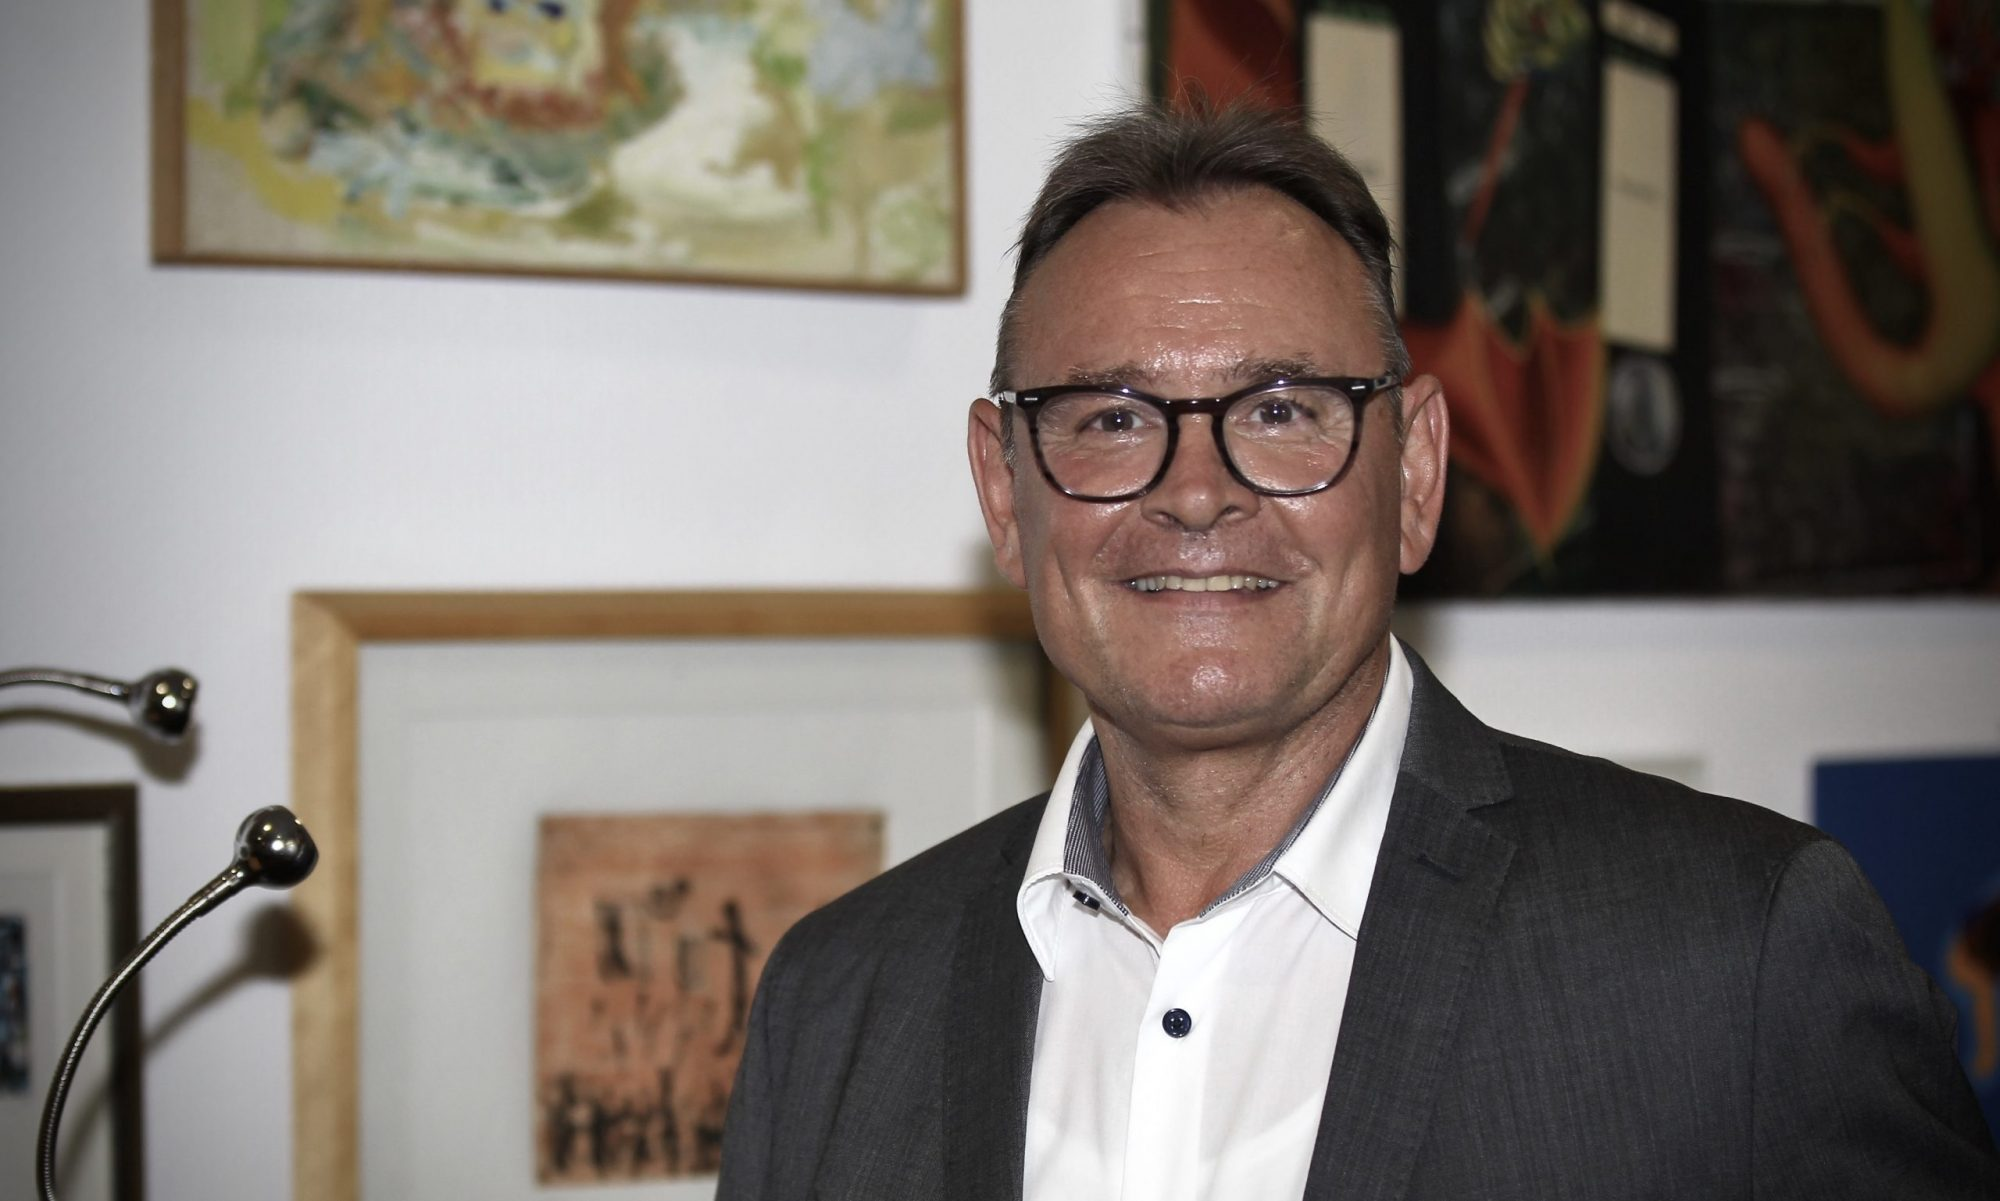 Michael Klaas